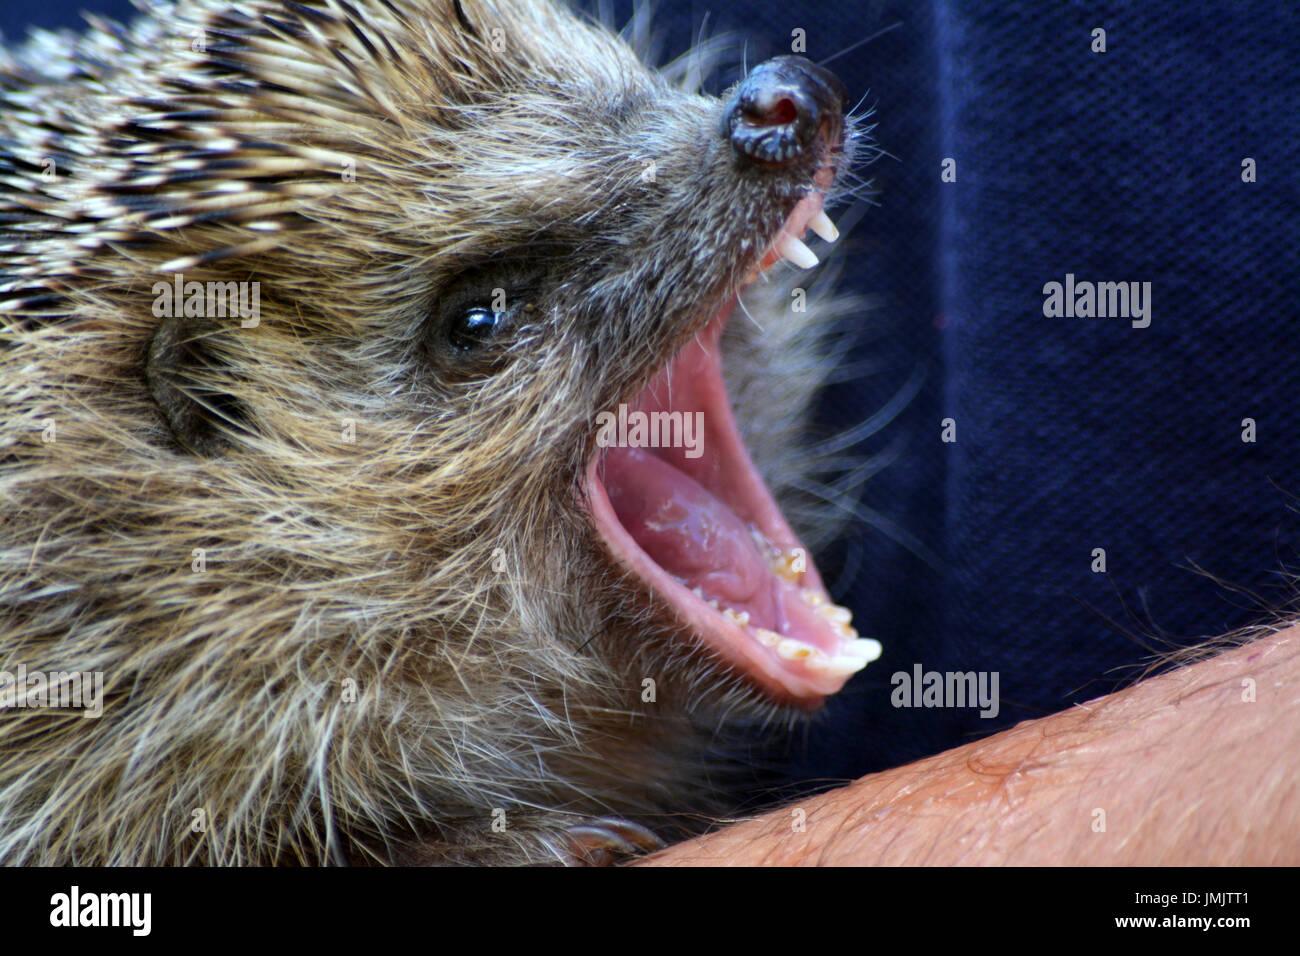 Hedgehog (Erinaceus europaeus) - Stock Image